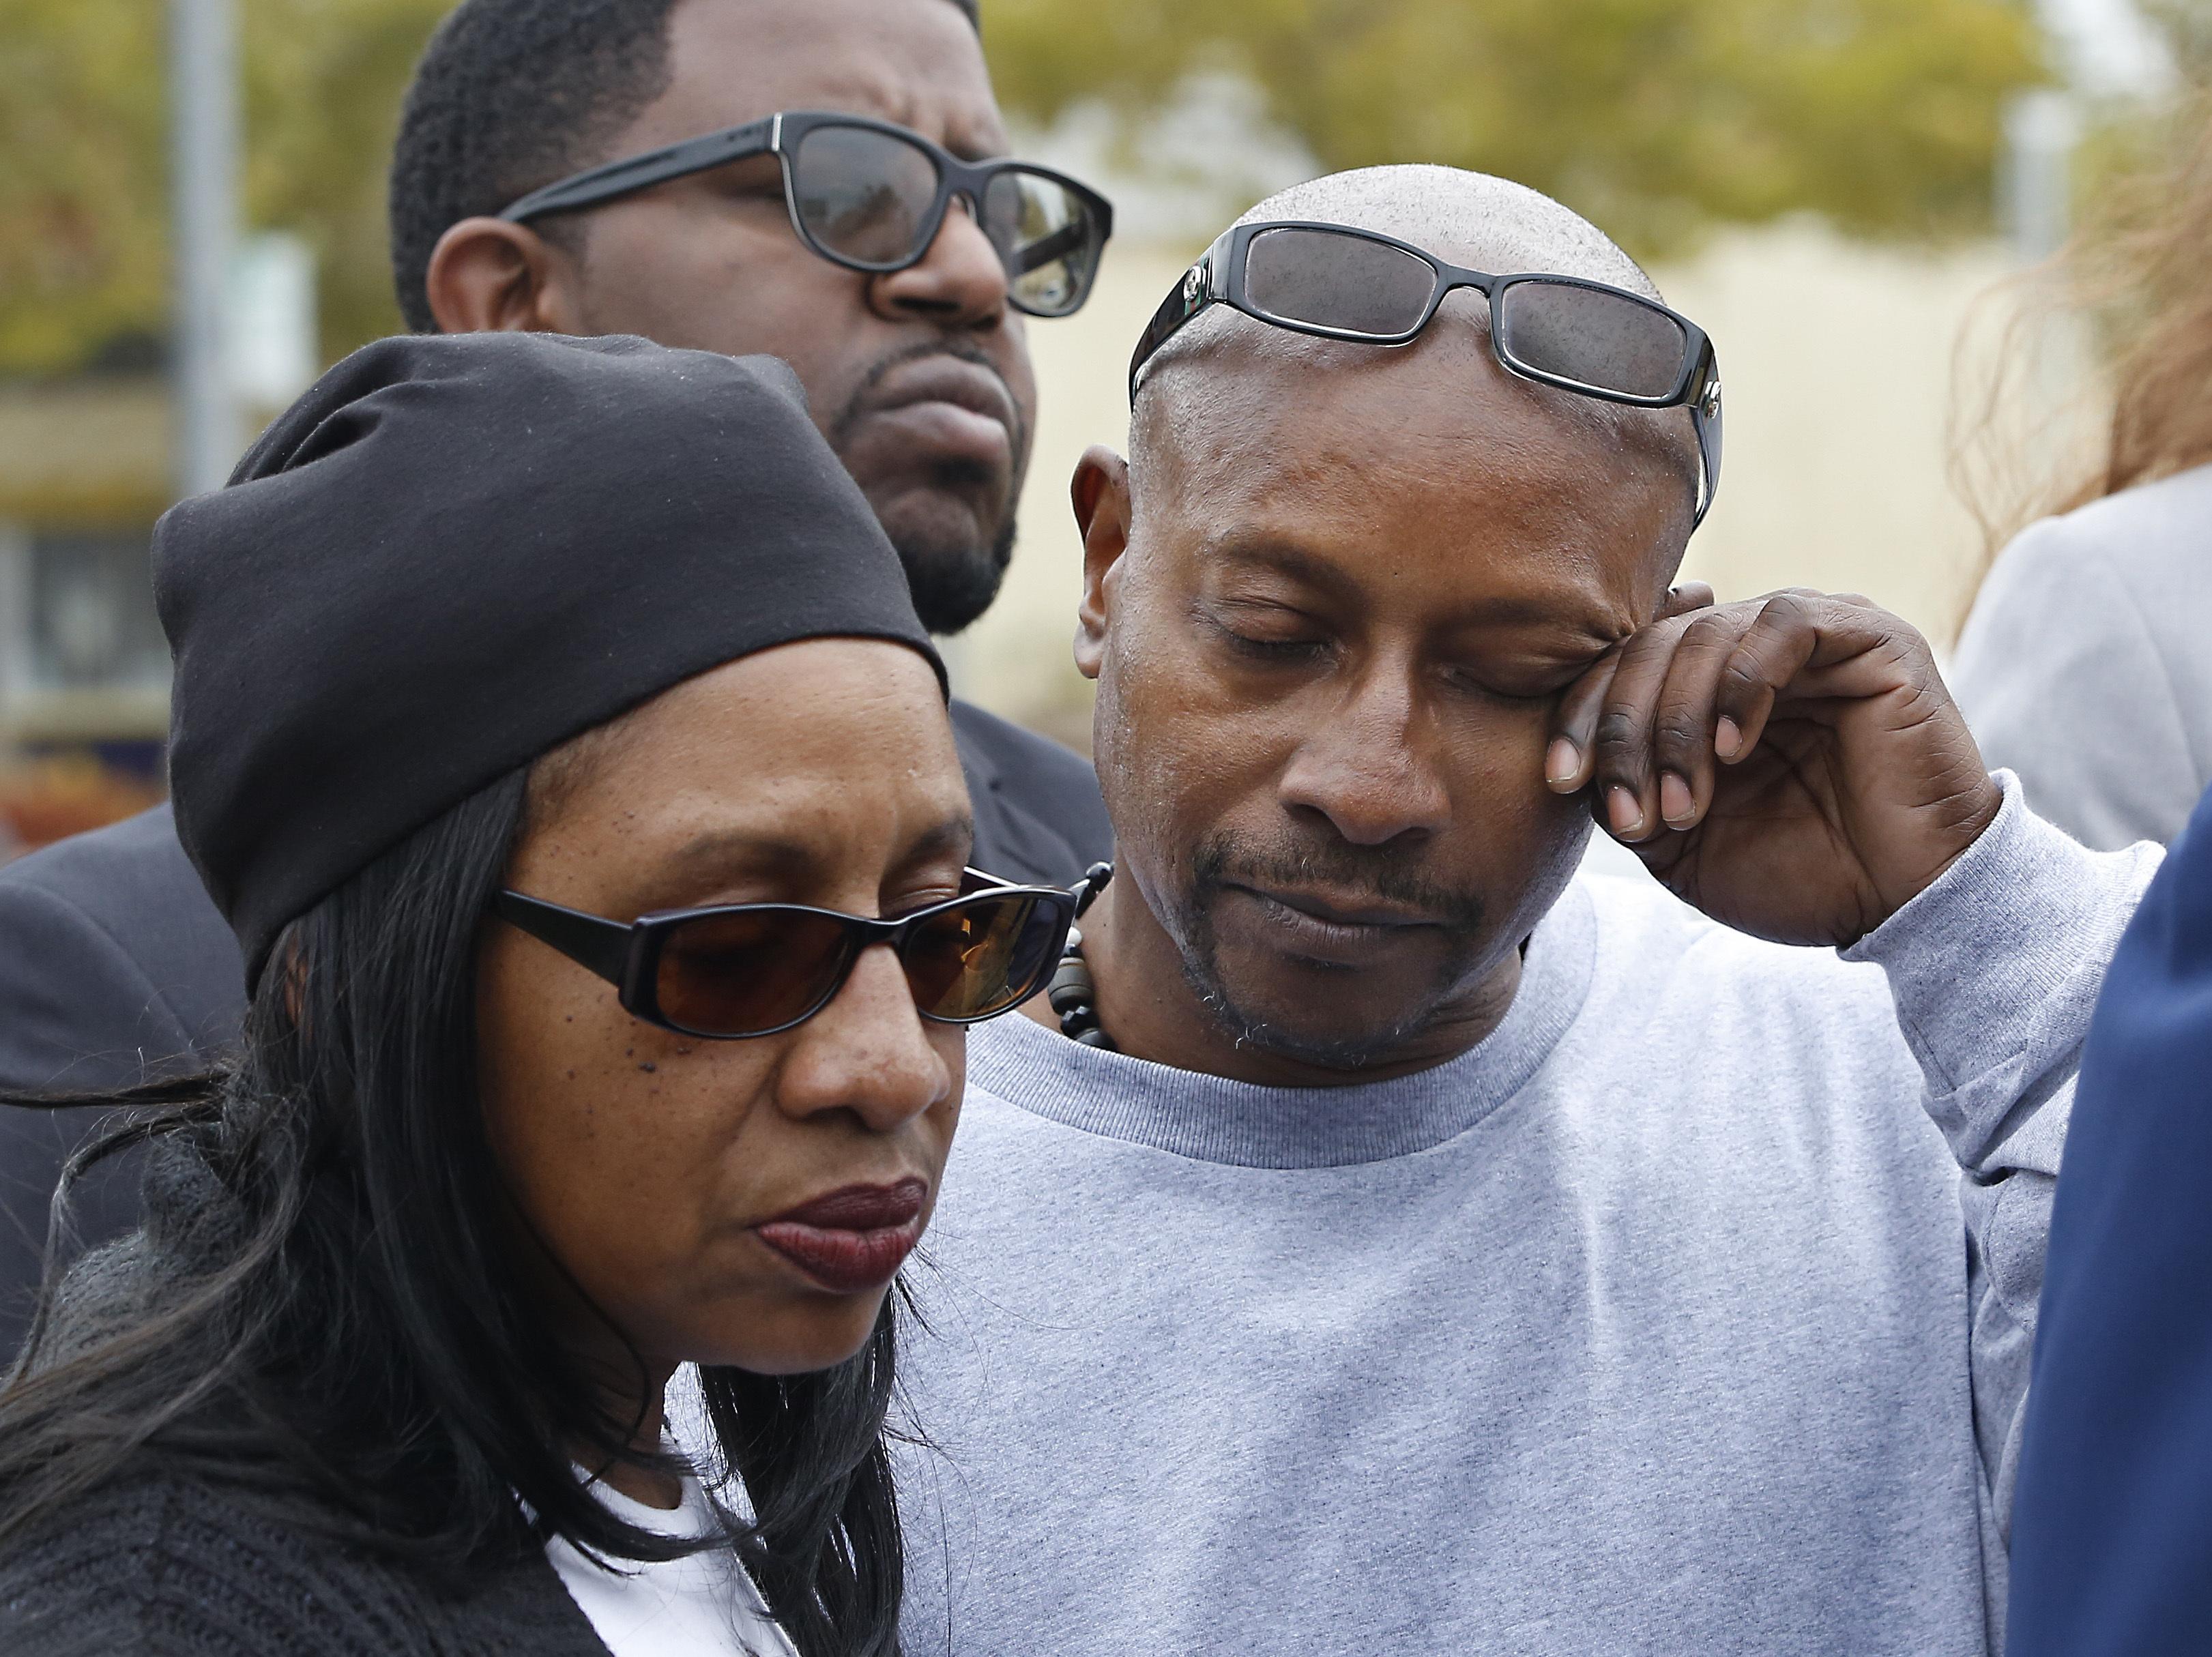 Family of black man shot 14 times by Sacramento